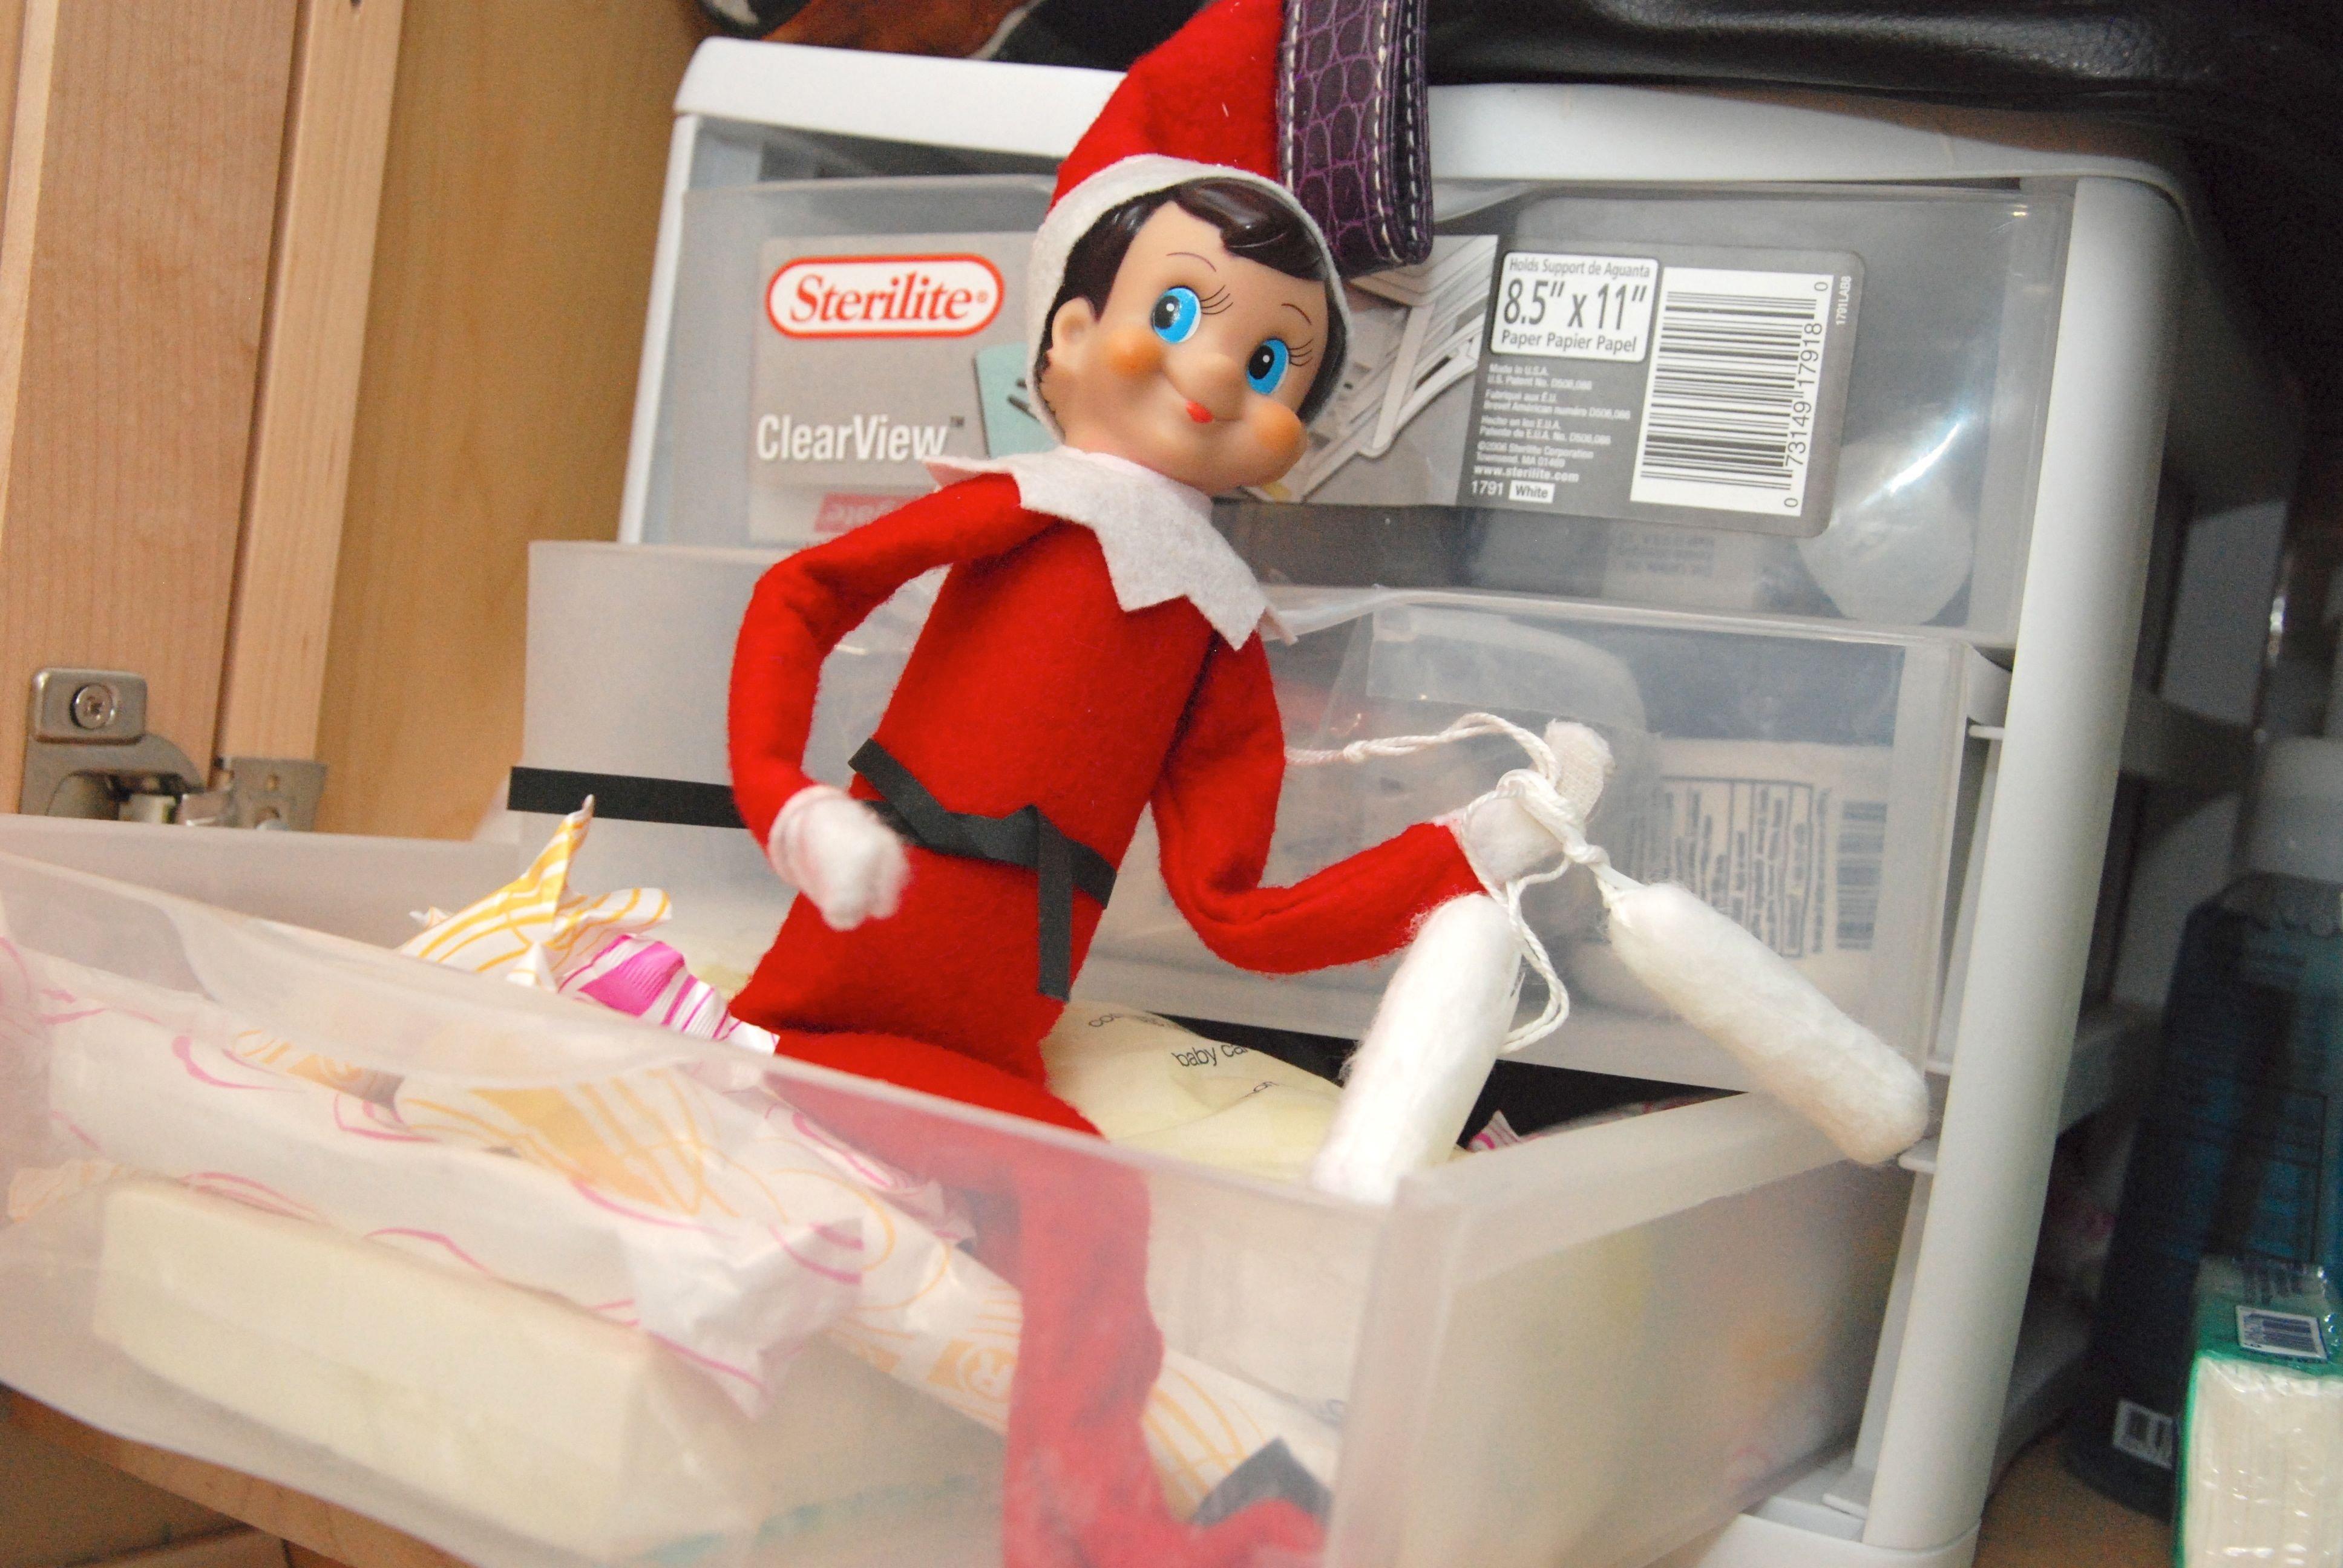 10 Stunning Bad Elf On The Shelf Ideas elf on the shelf ideas week 2 dirty diaper laundry 2 2020